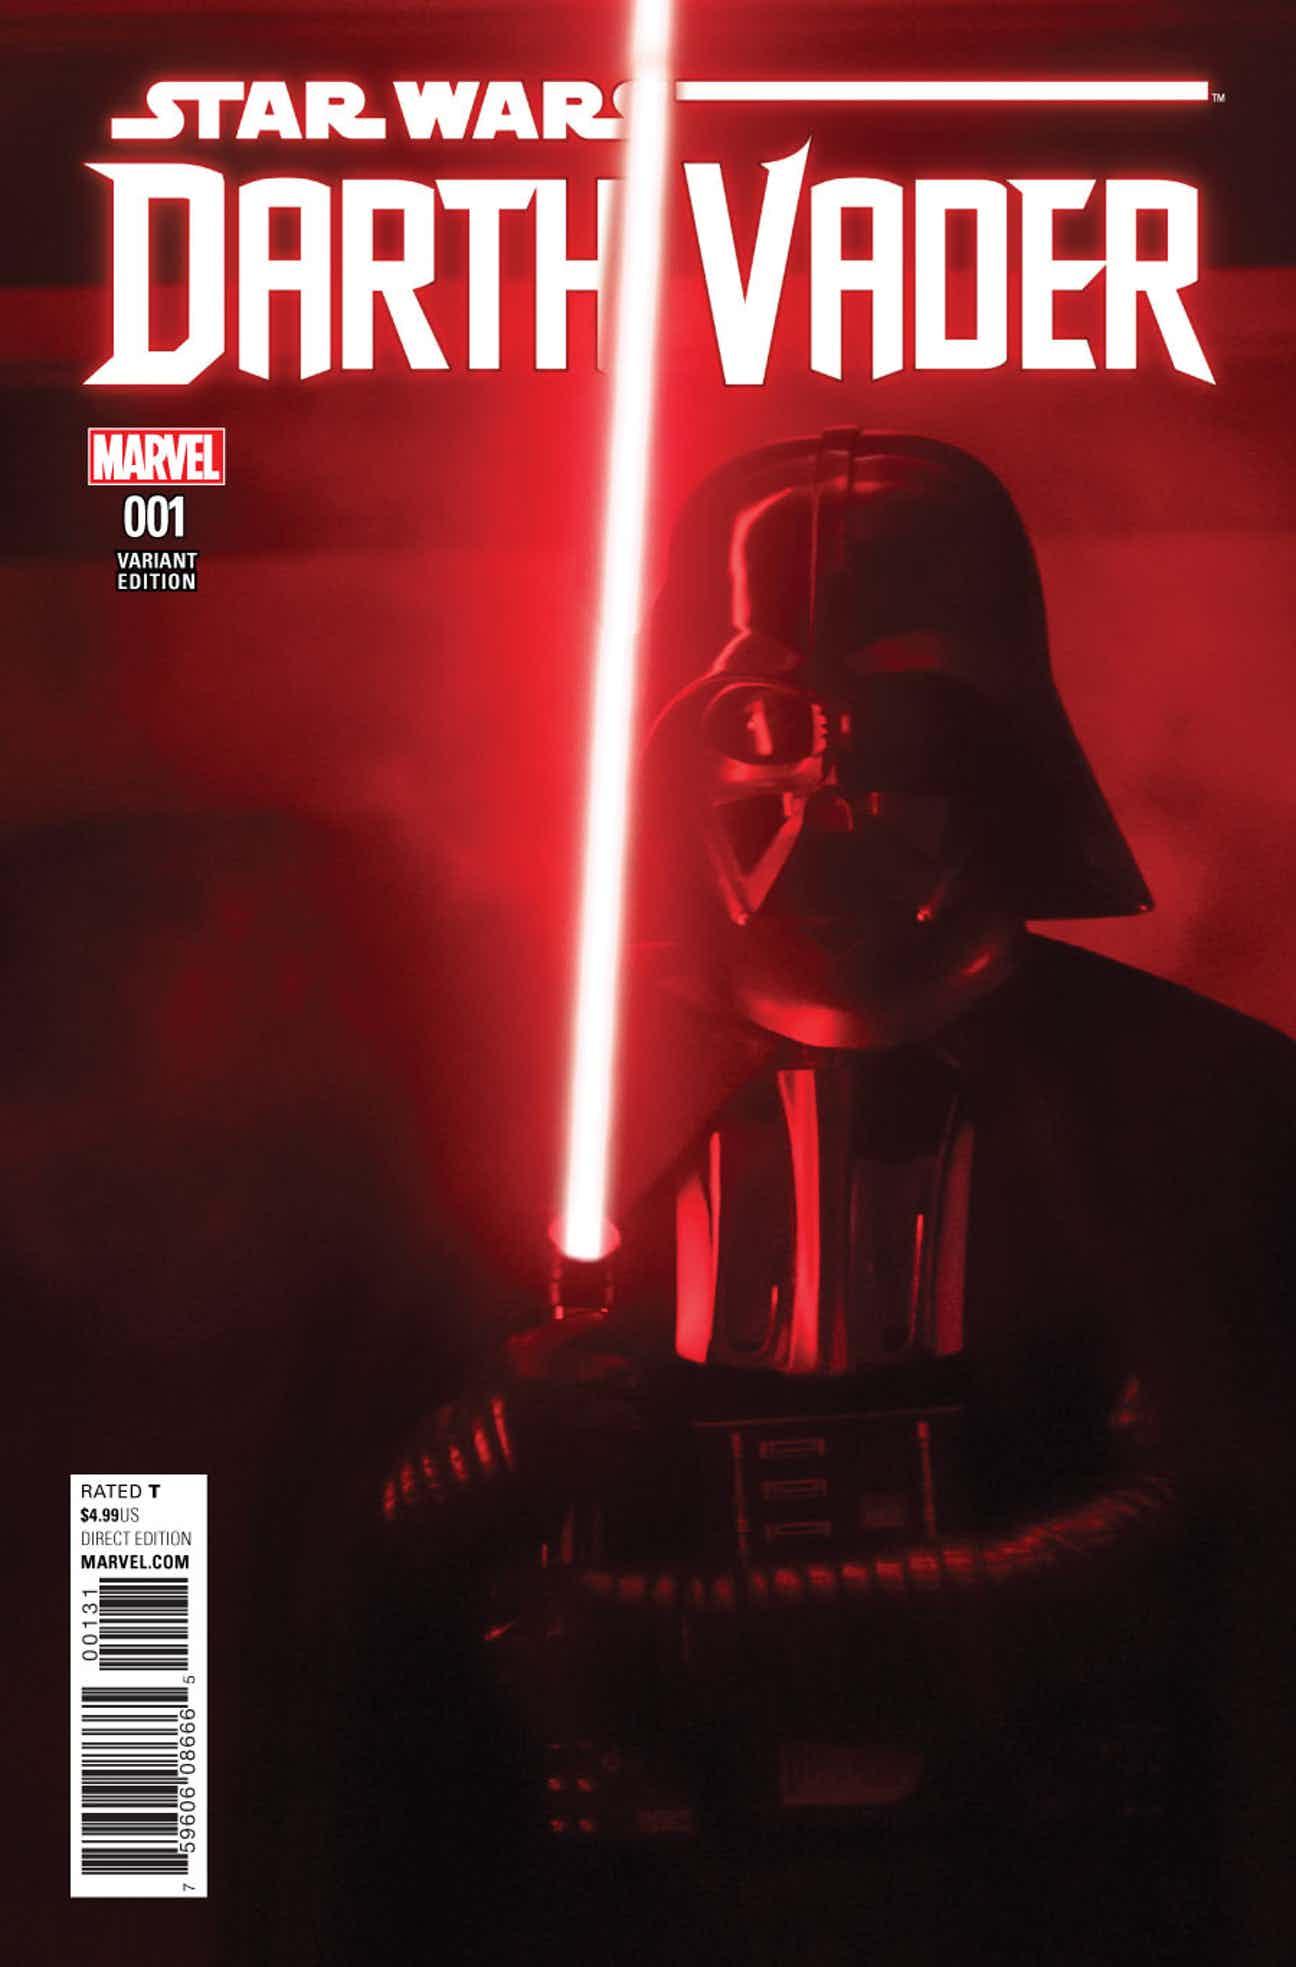 Darth Vader 1 Variant cover